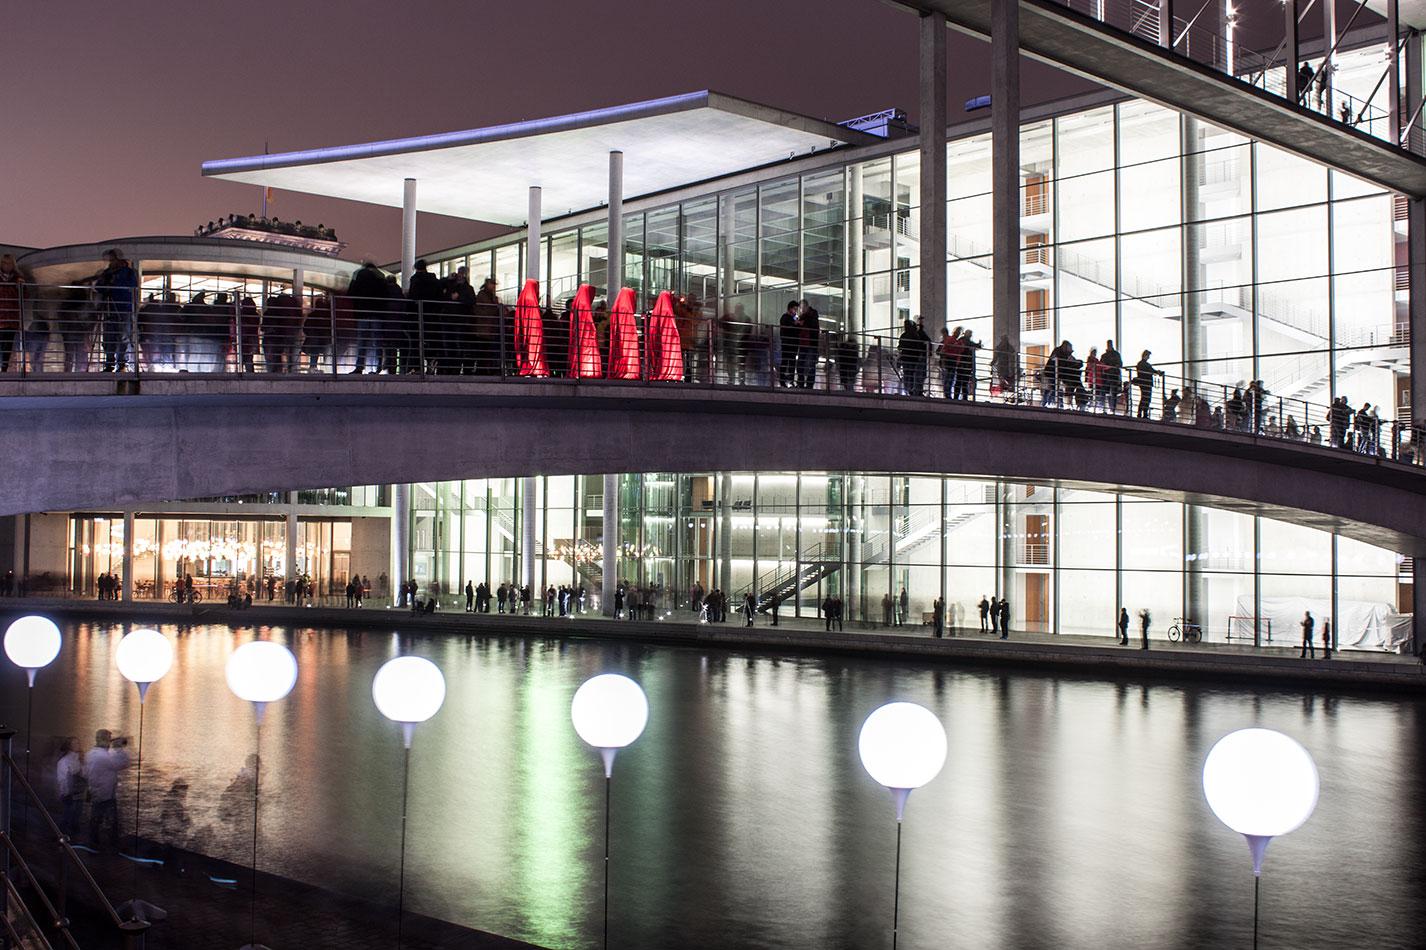 25-years-wallfall-berlin-germany-contemporary-fine-art-show-arts-design-sculpture-public-arts-arte-antique-guardians-of-time-manfred-kili-kielnhofer-4604